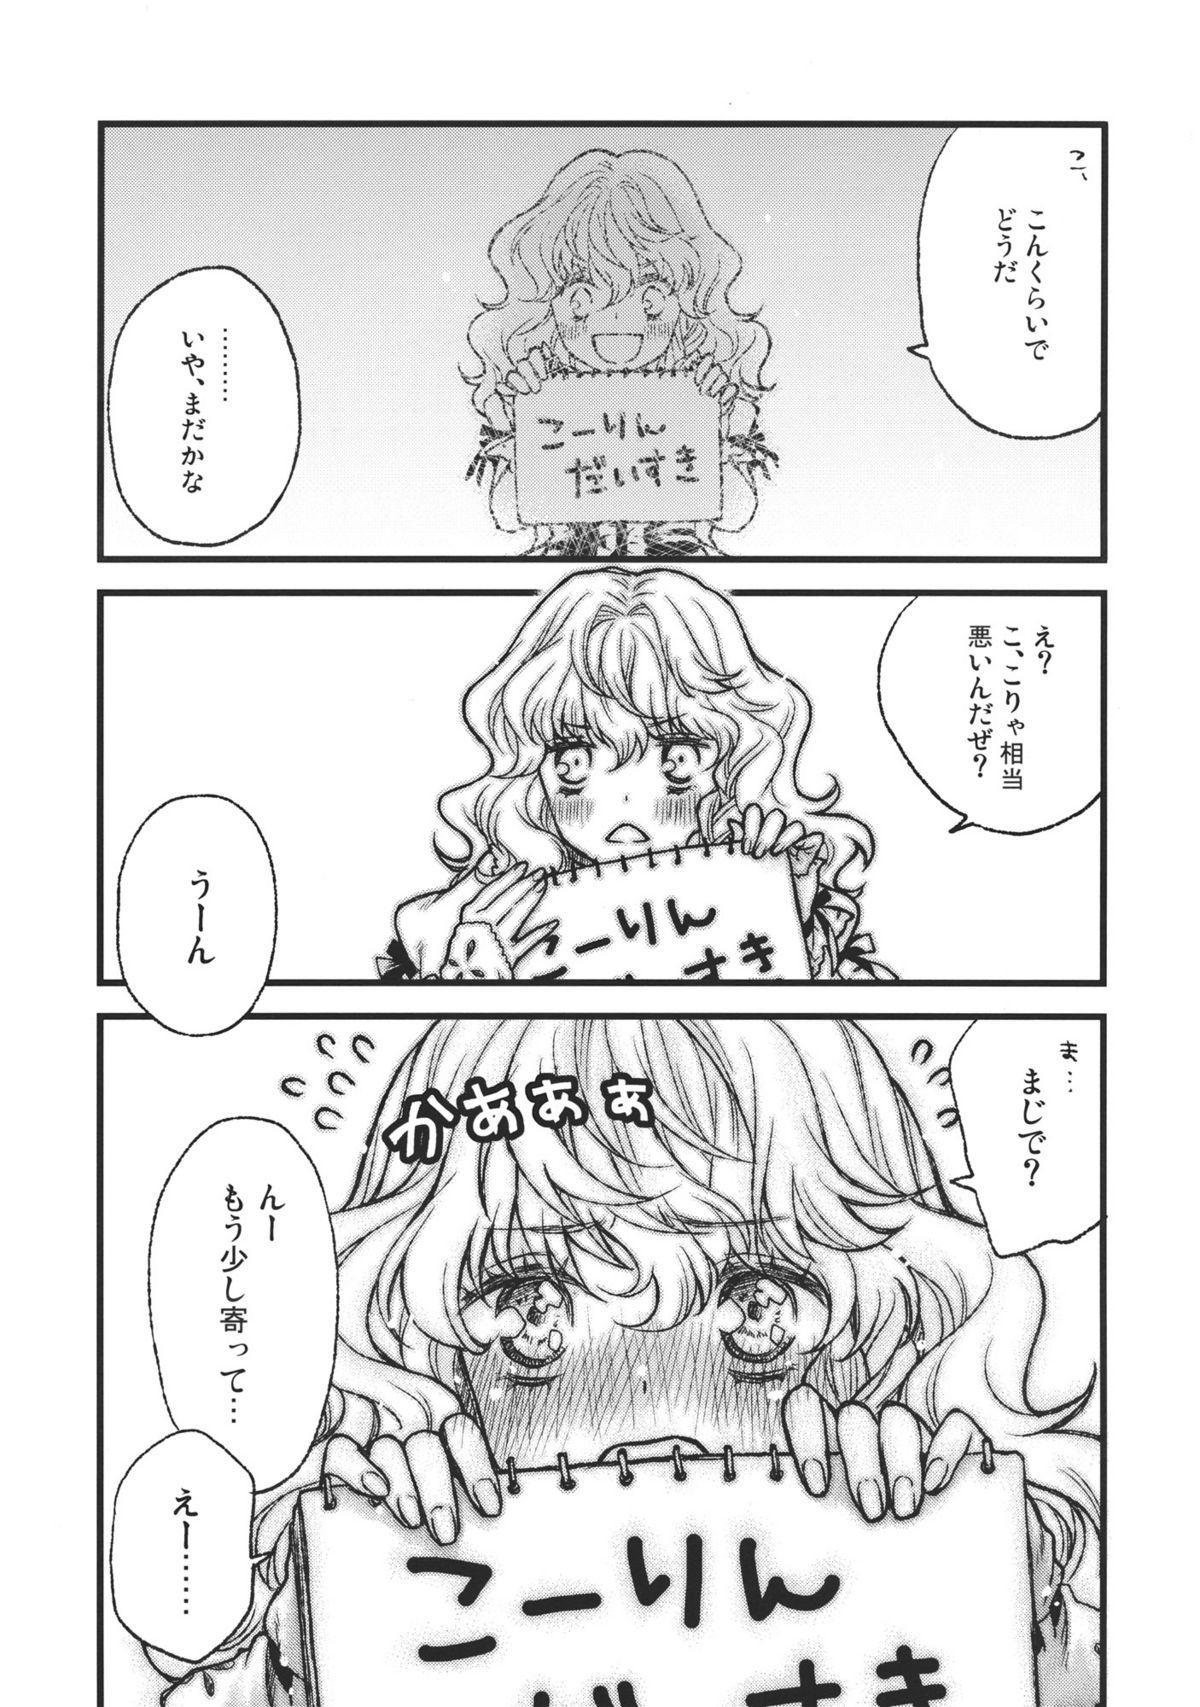 Koimegane / Iromegane 8